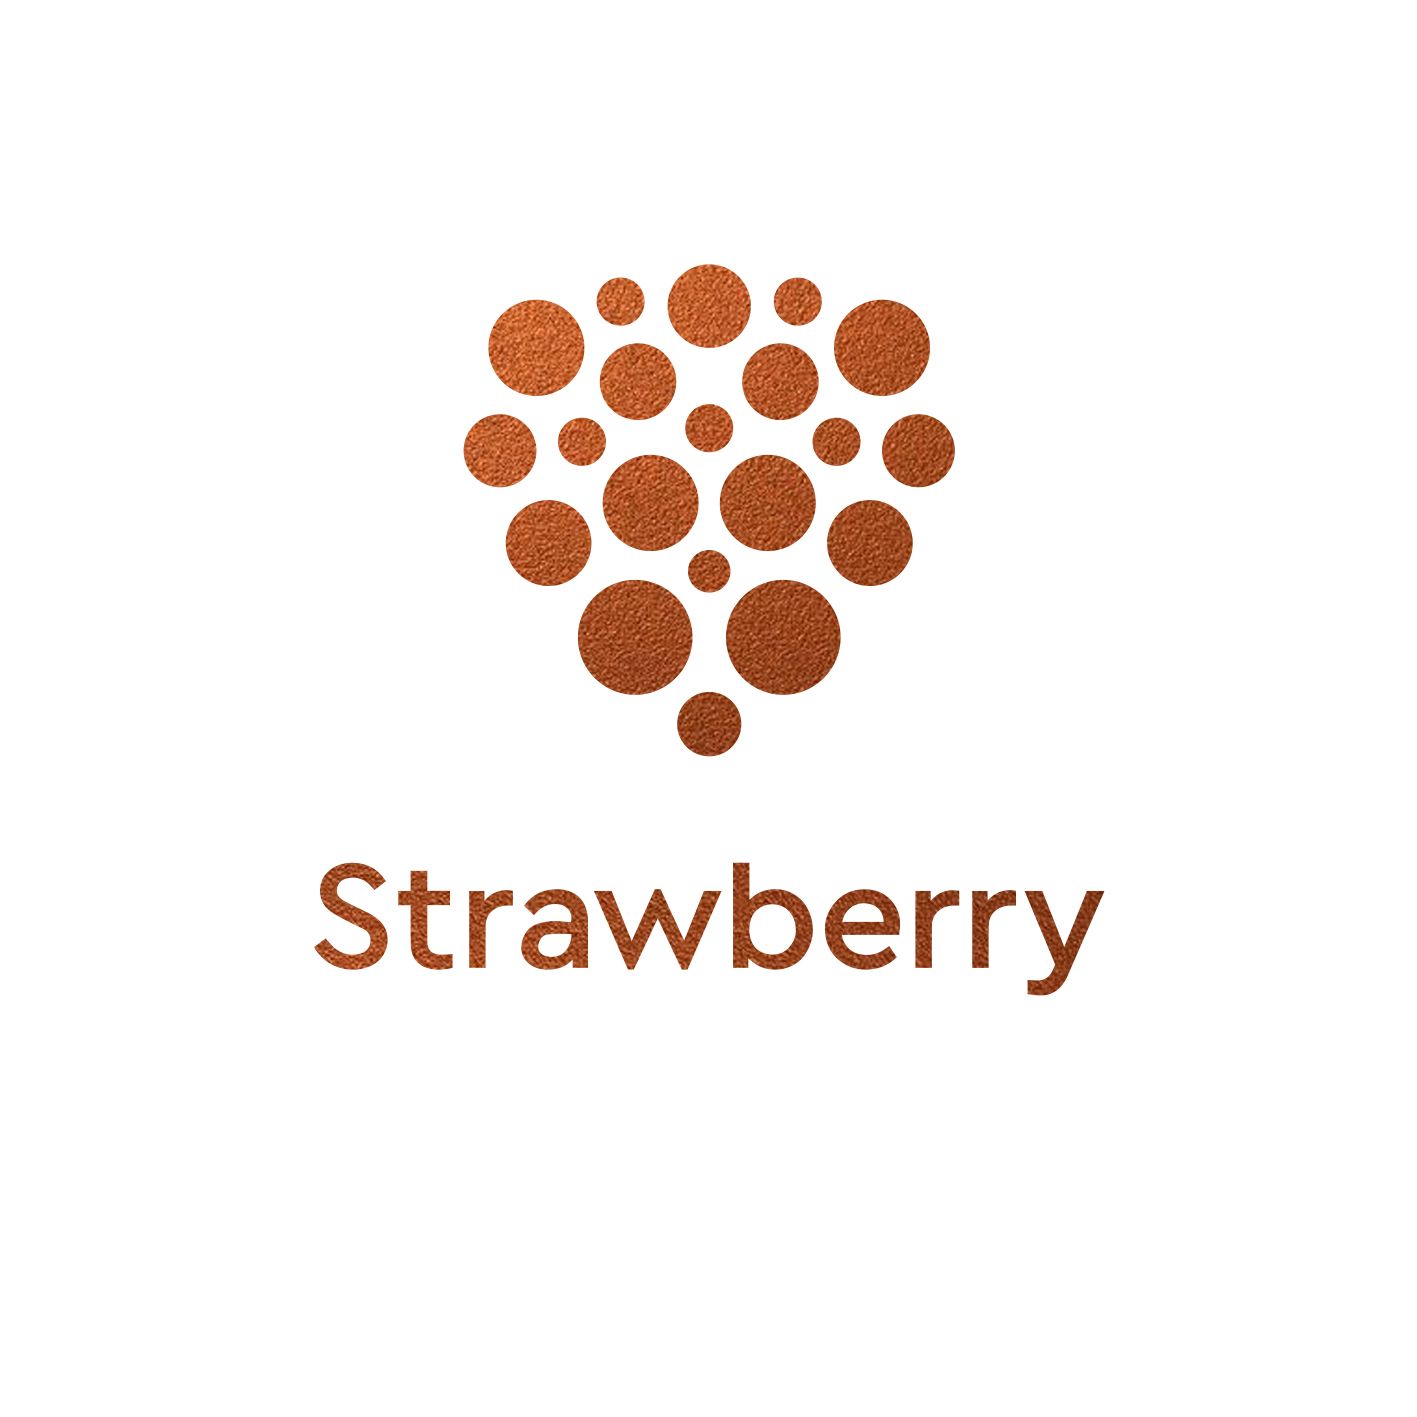 Strawberry_logo_copper.jpg